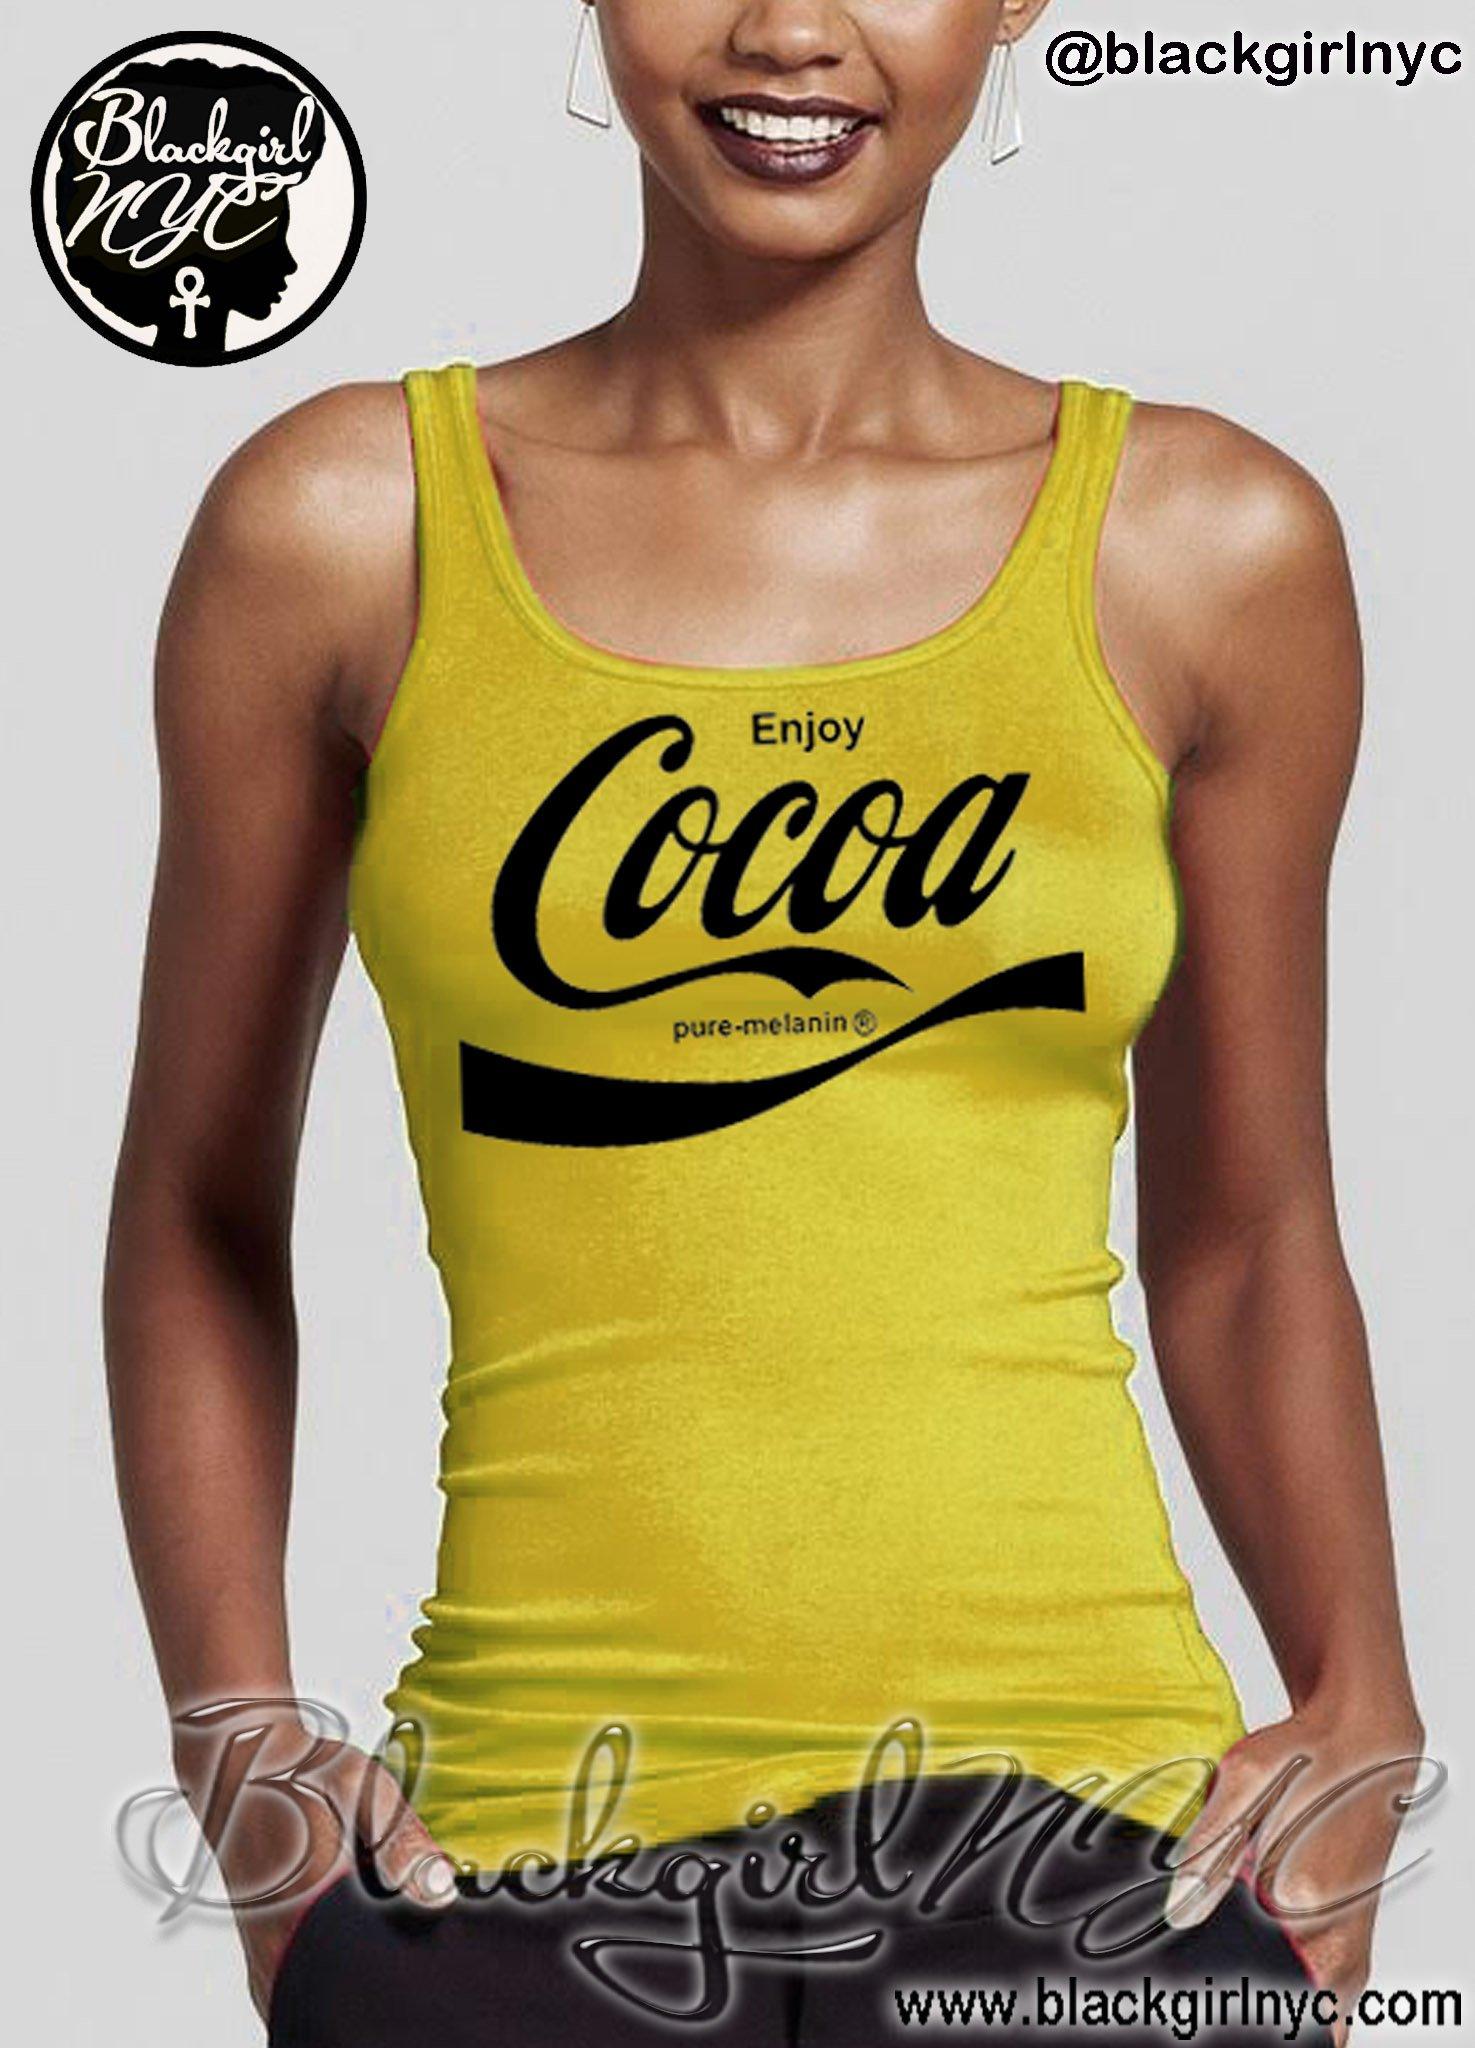 Image of YELLOW - (enjoy) COCOA - pure melanin